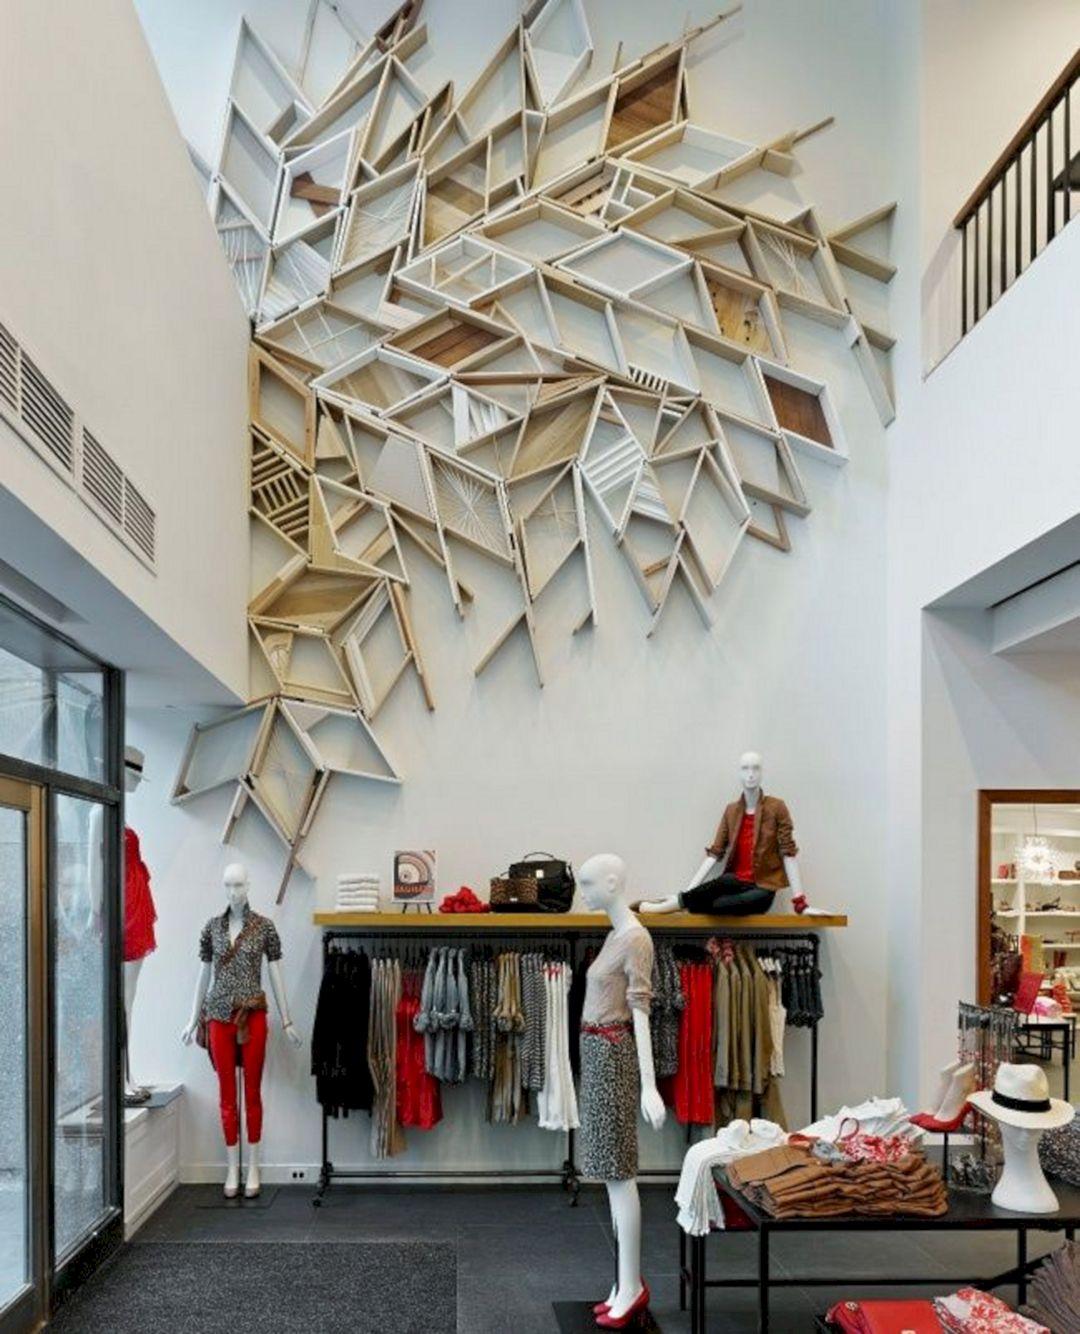 Home Gallery Design Ideas: Wall Art Installation (Wall Art Installation) Design Ideas